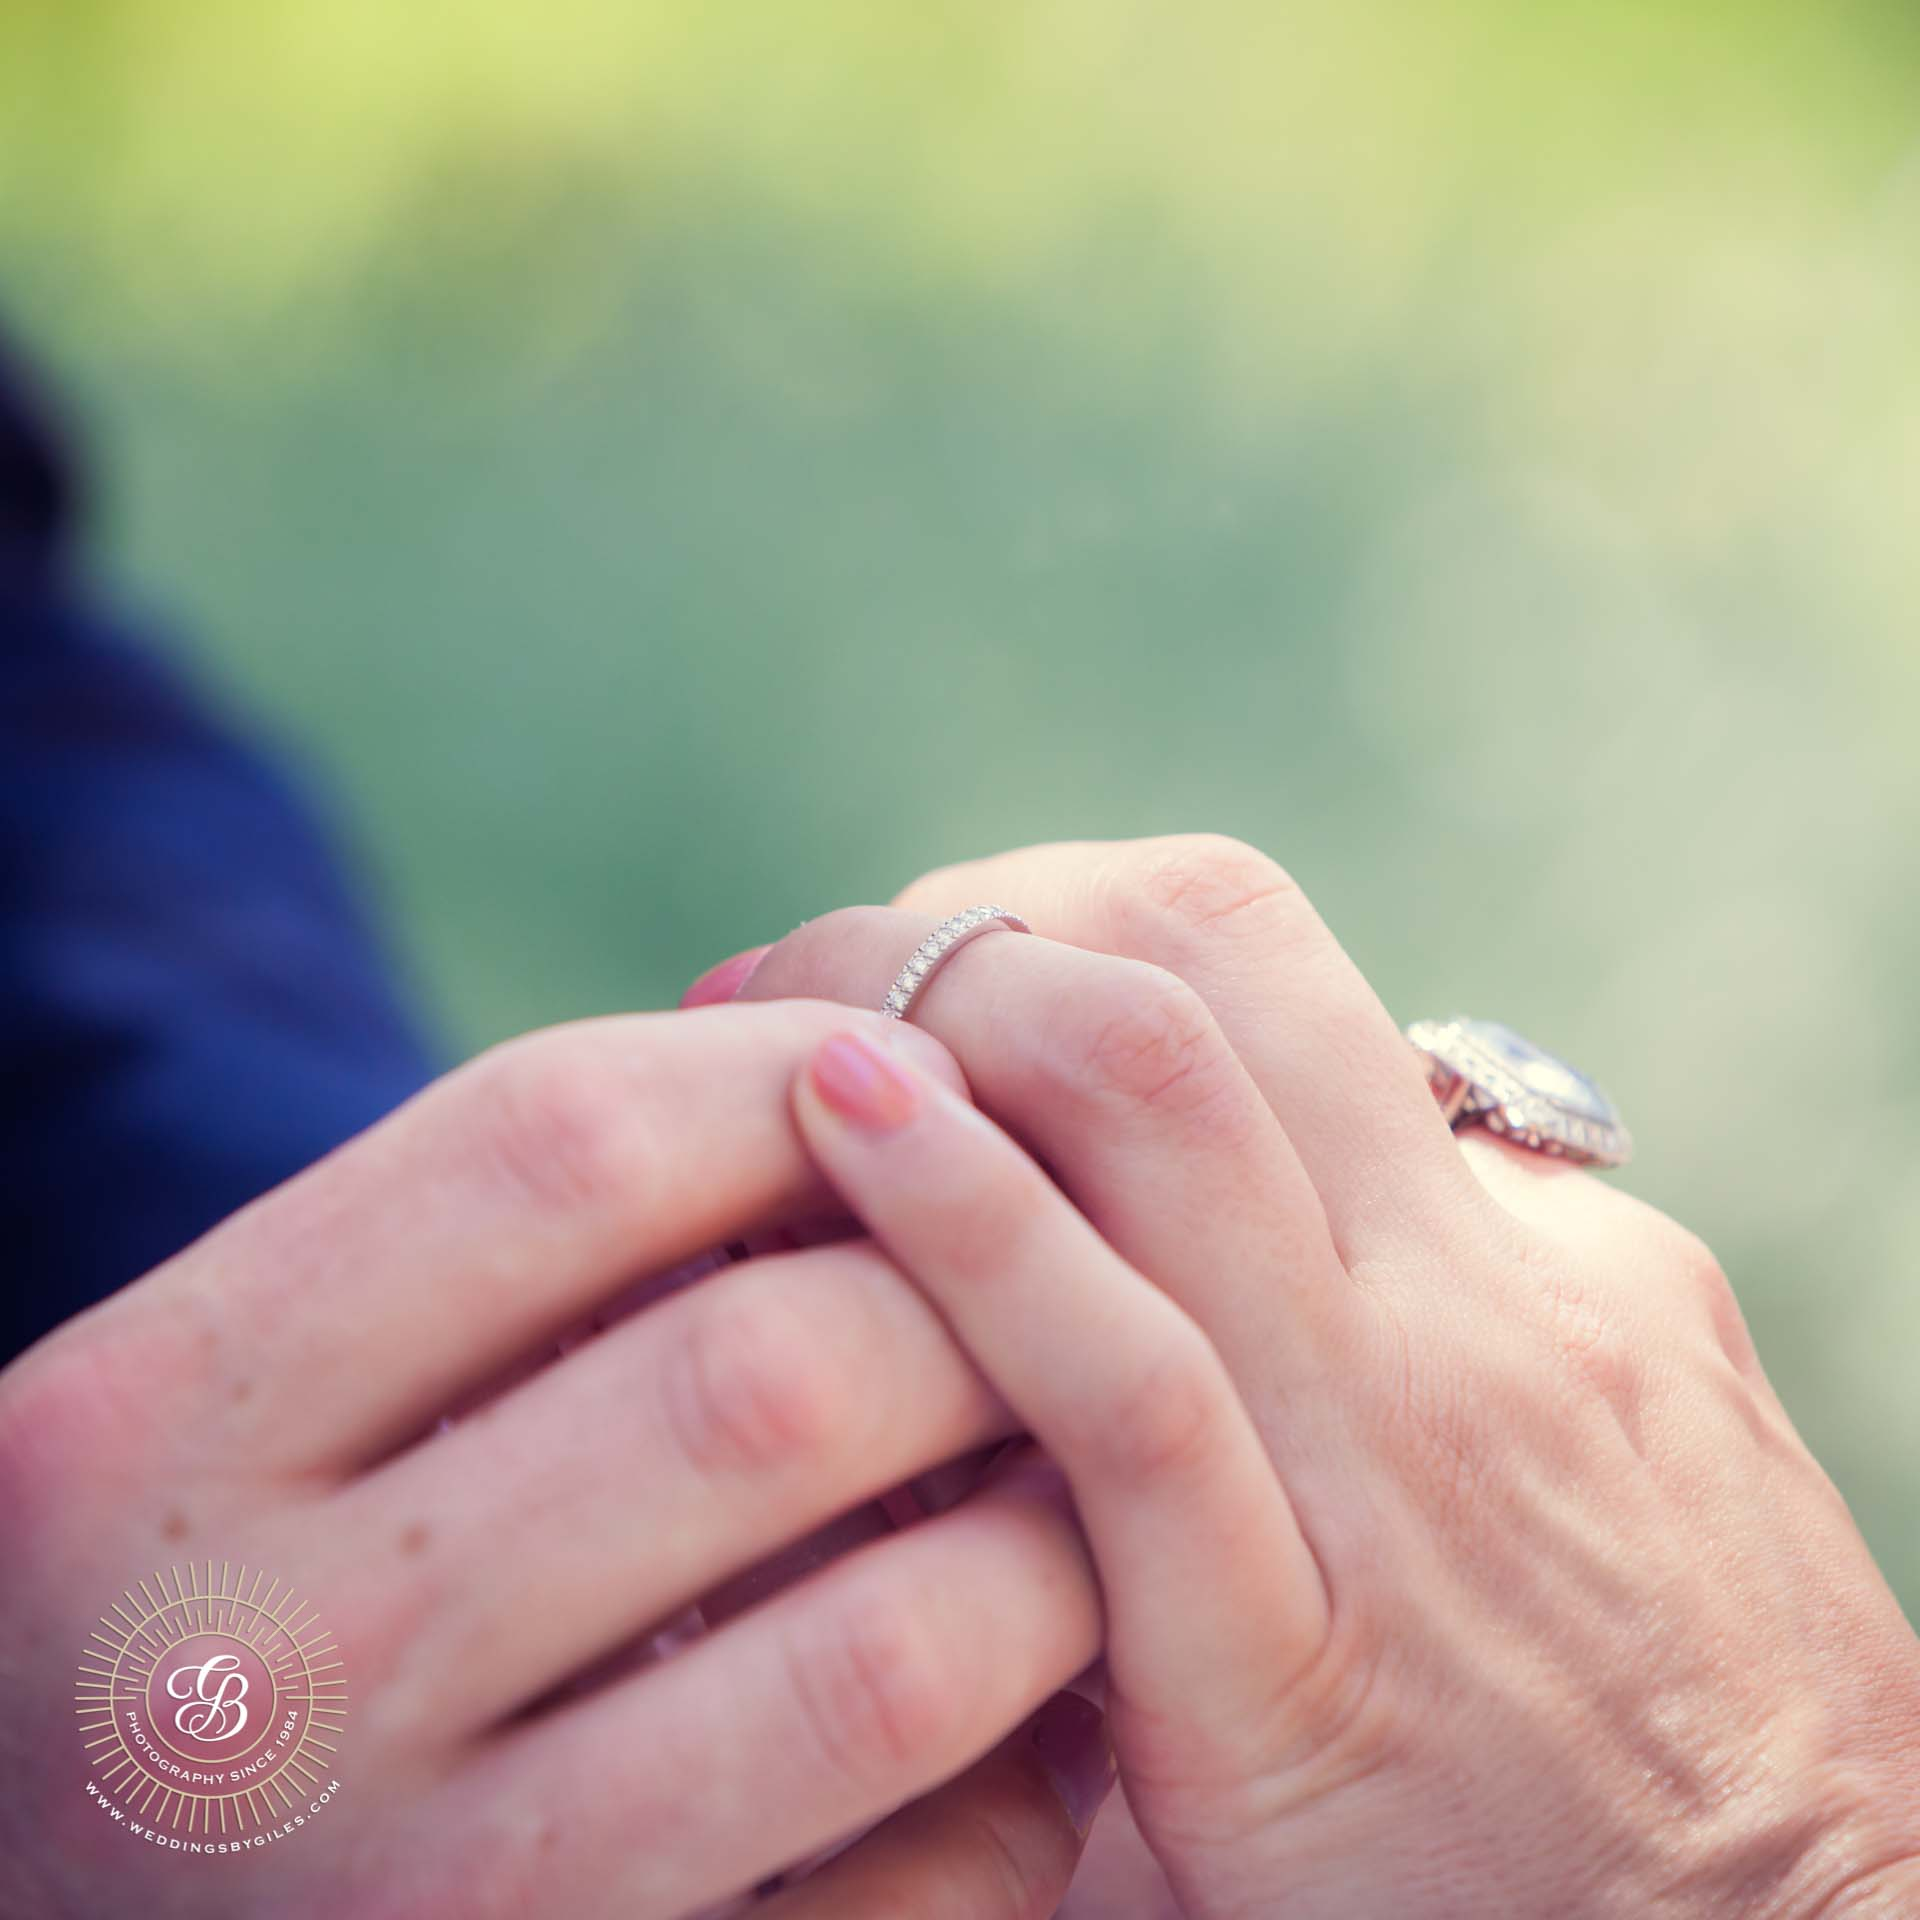 wedding ring on the brides finger